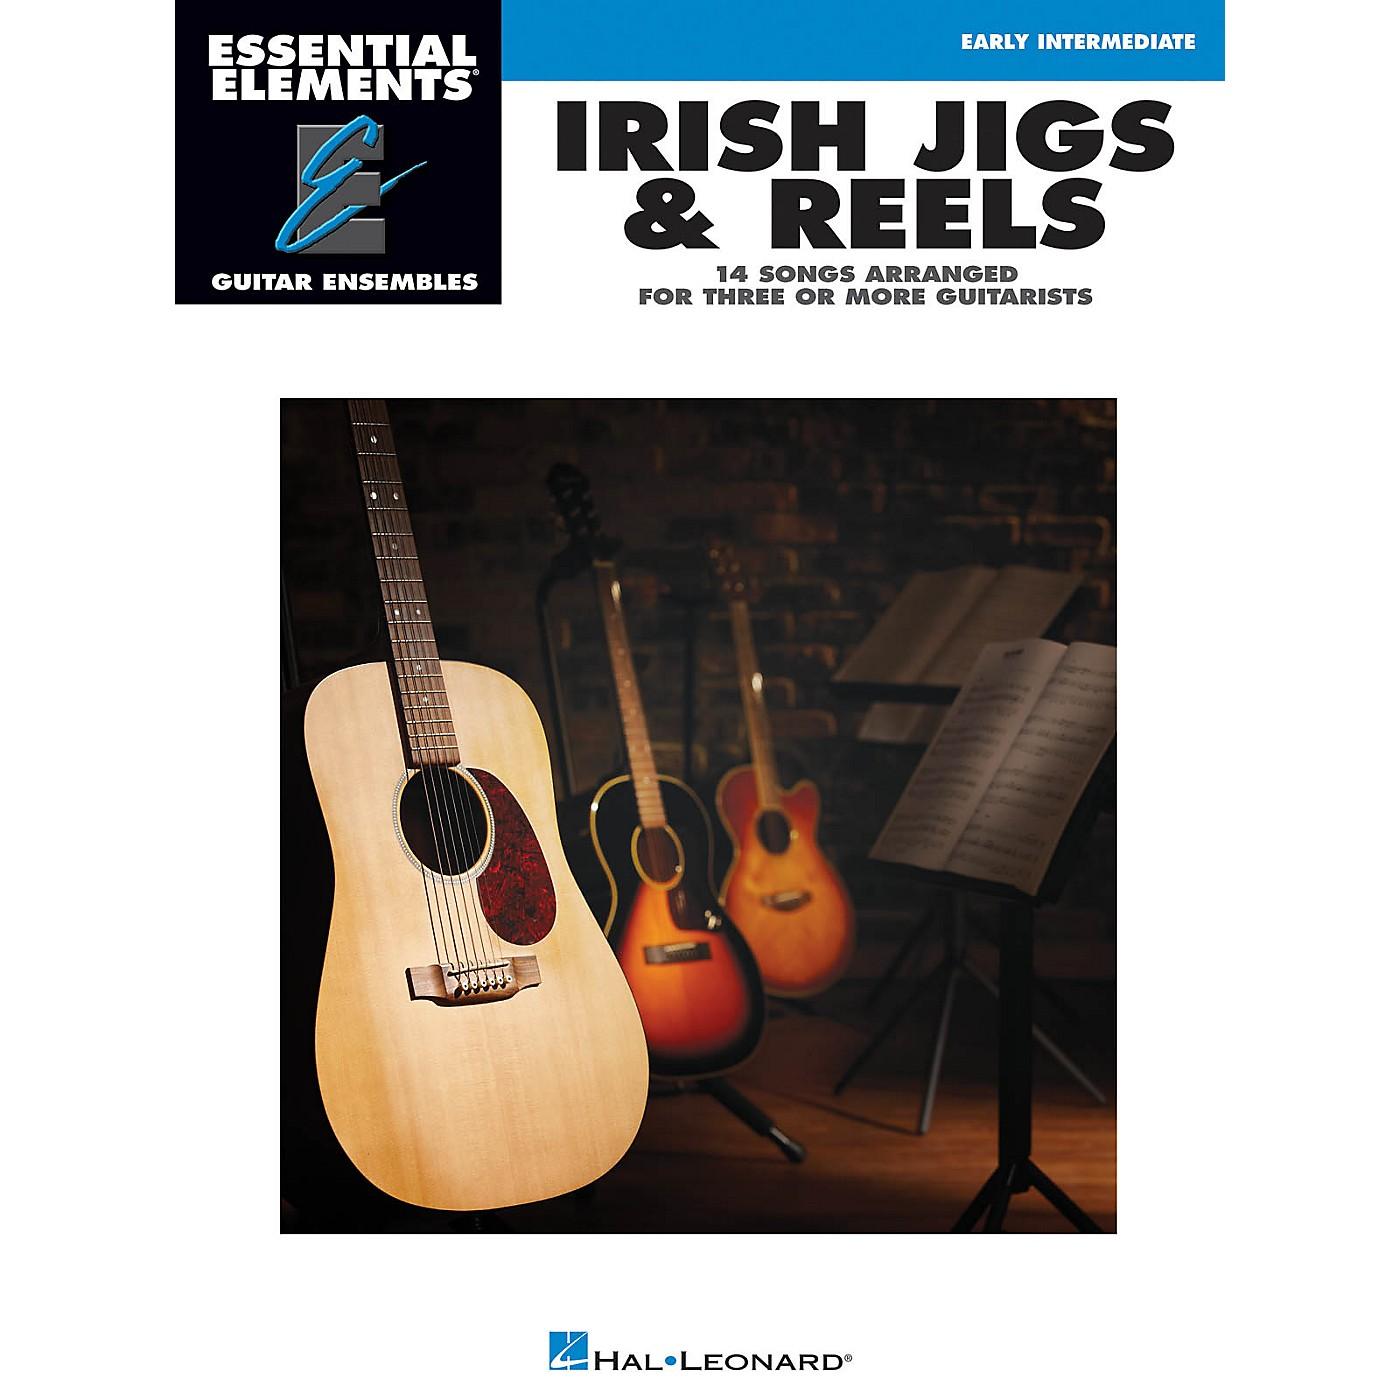 Hal Leonard Irish Jigs & Reels Essential Elements Guitar Series Softcover thumbnail